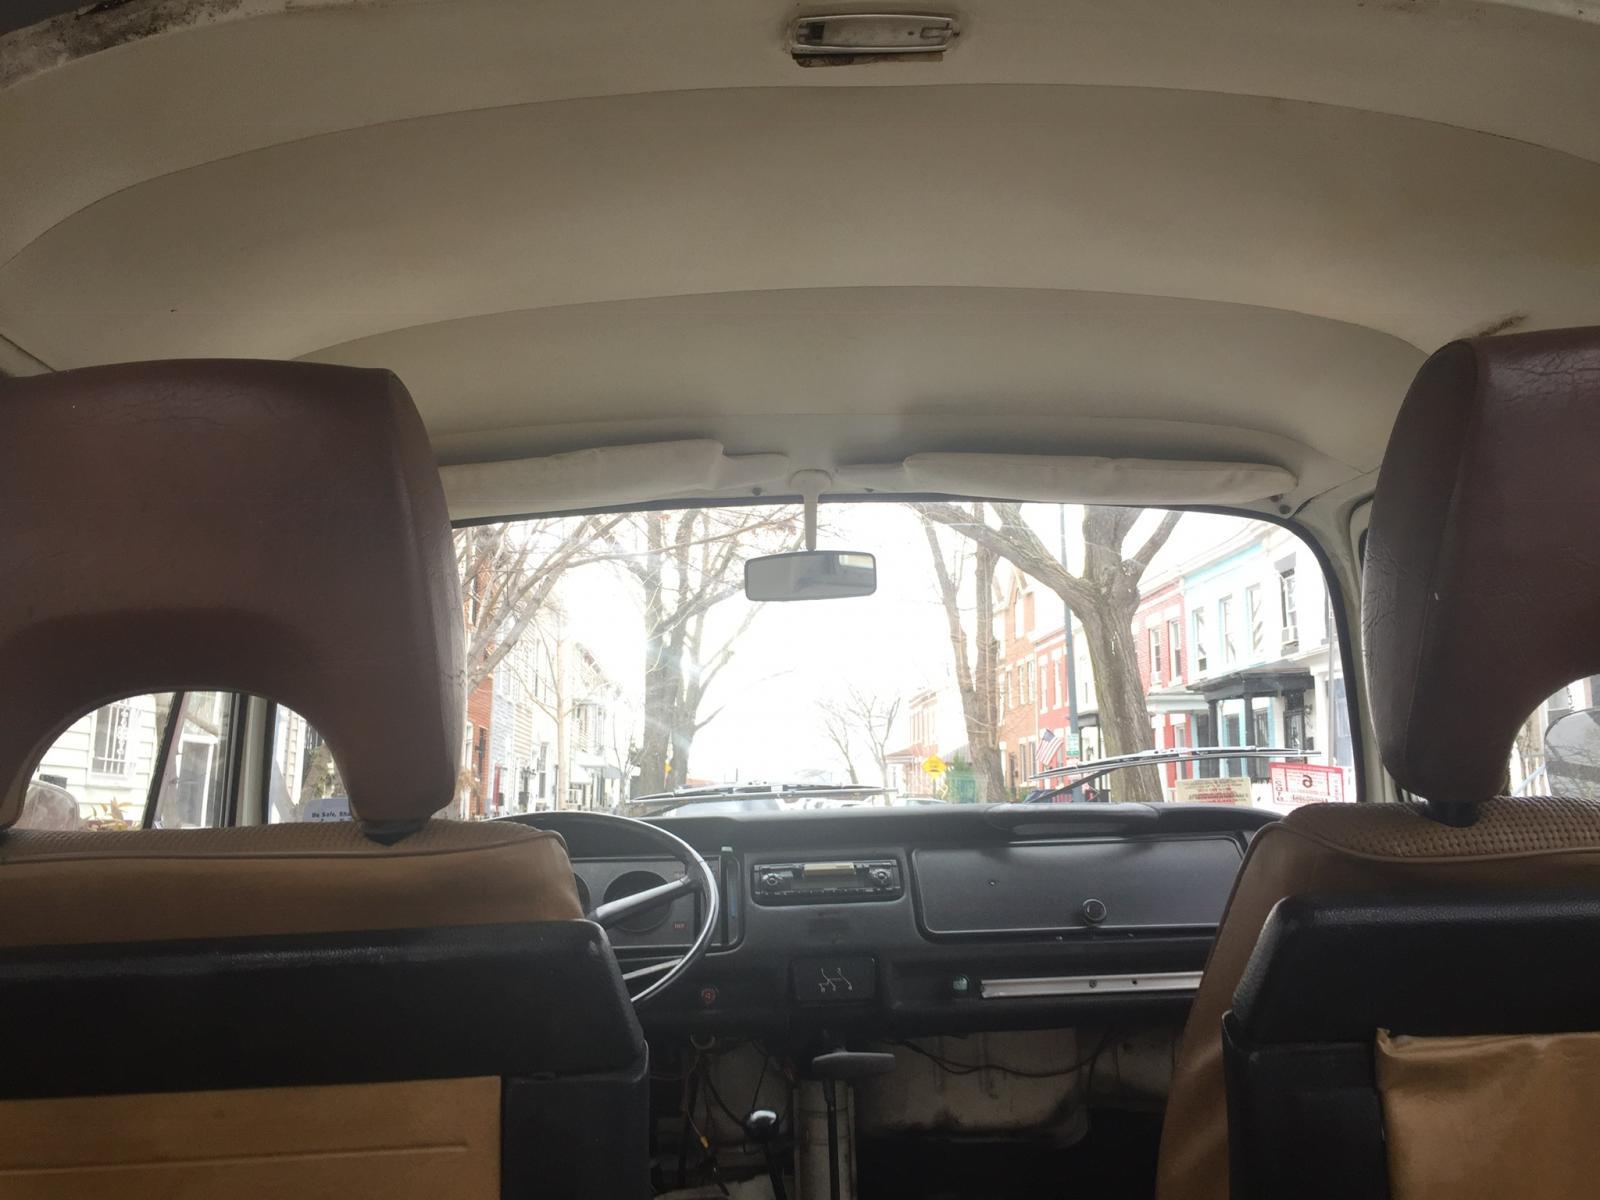 More photos of Tub Bus